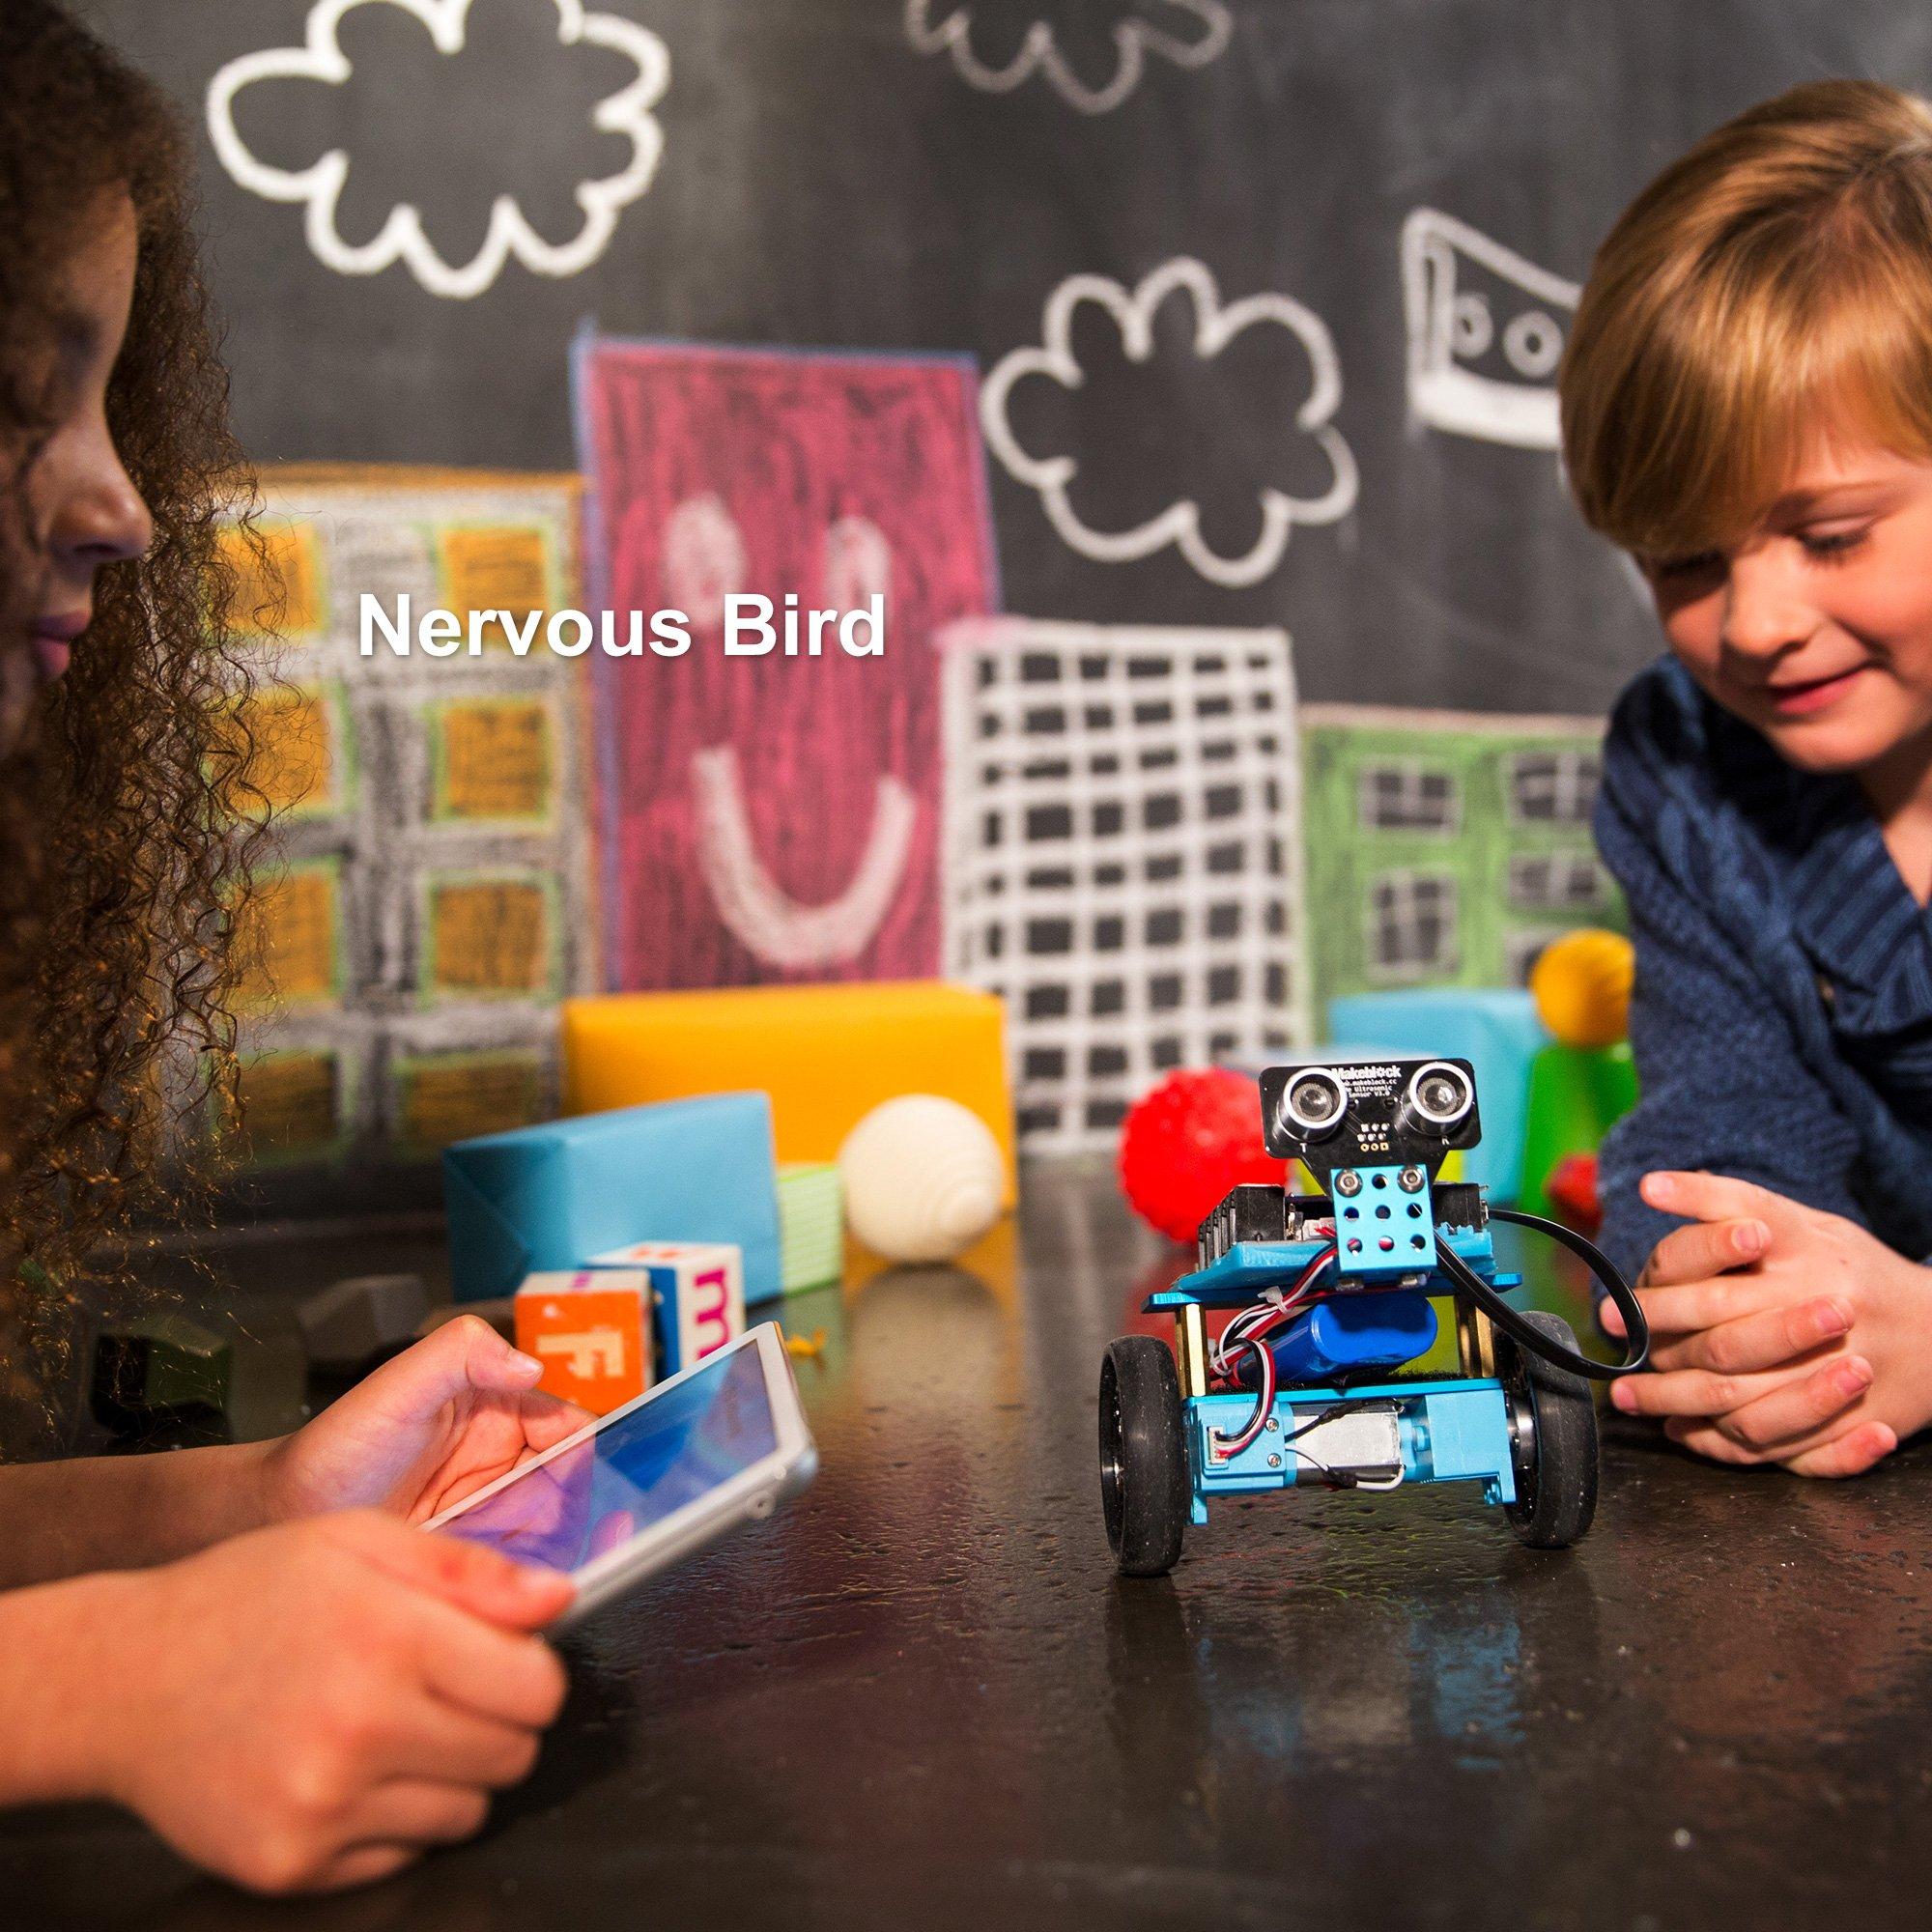 Makeblock Programmable mBot Ranger Robot Kit, STEM Educational Engineering Design & Build 3 in 1 Programmable Robotic System Kit - Ages 10+ by Makeblock (Image #4)